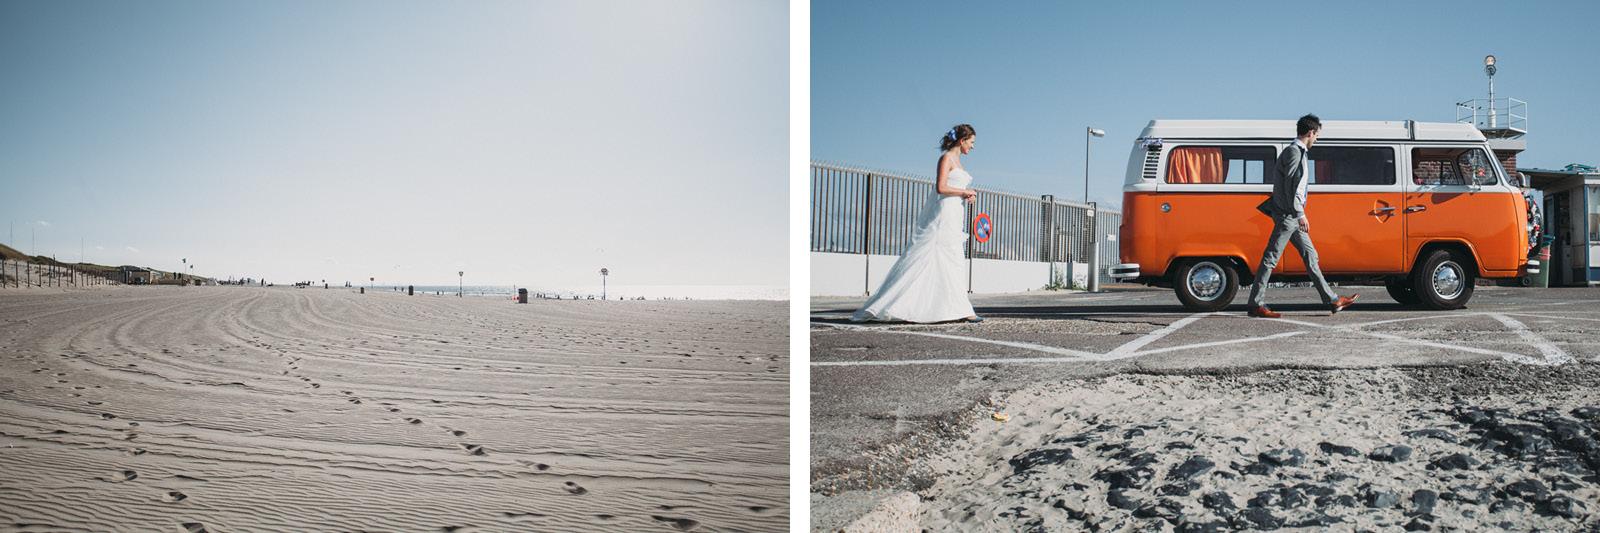 Evabloem_trouwen-sint-joris-doele_strandpaviljoen-zuid-62.jpg